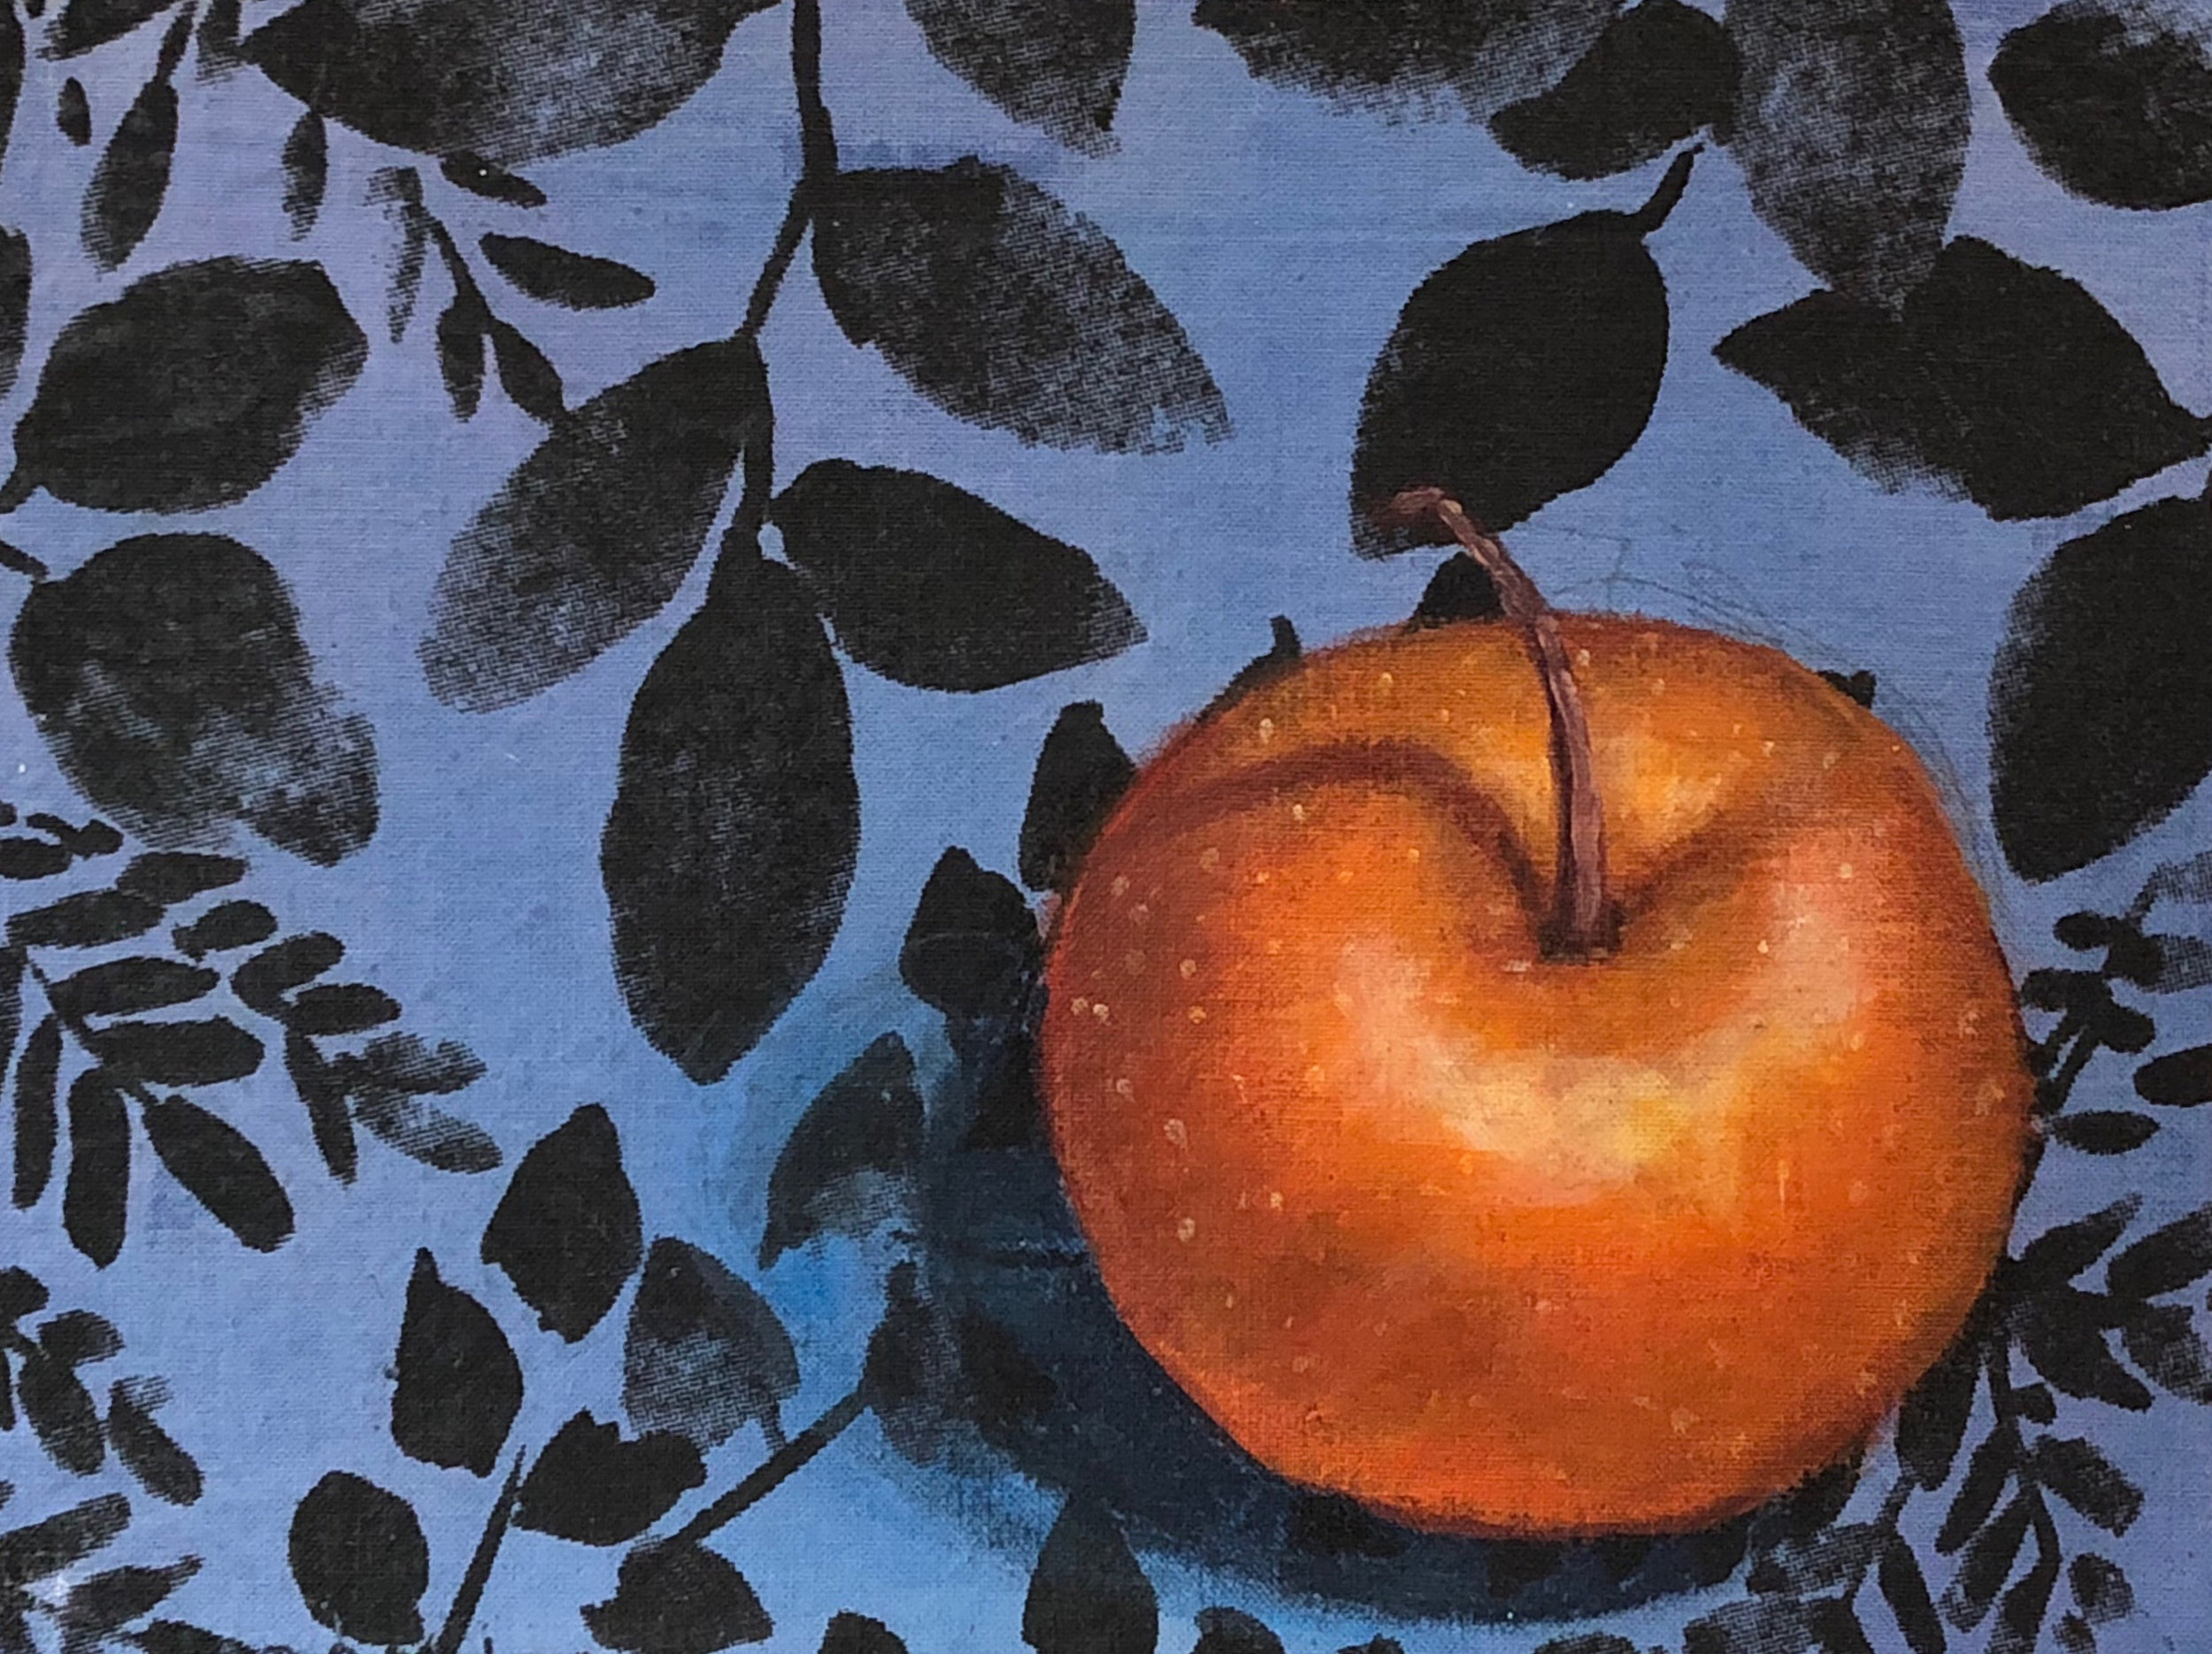 Asian Pear on Fabric